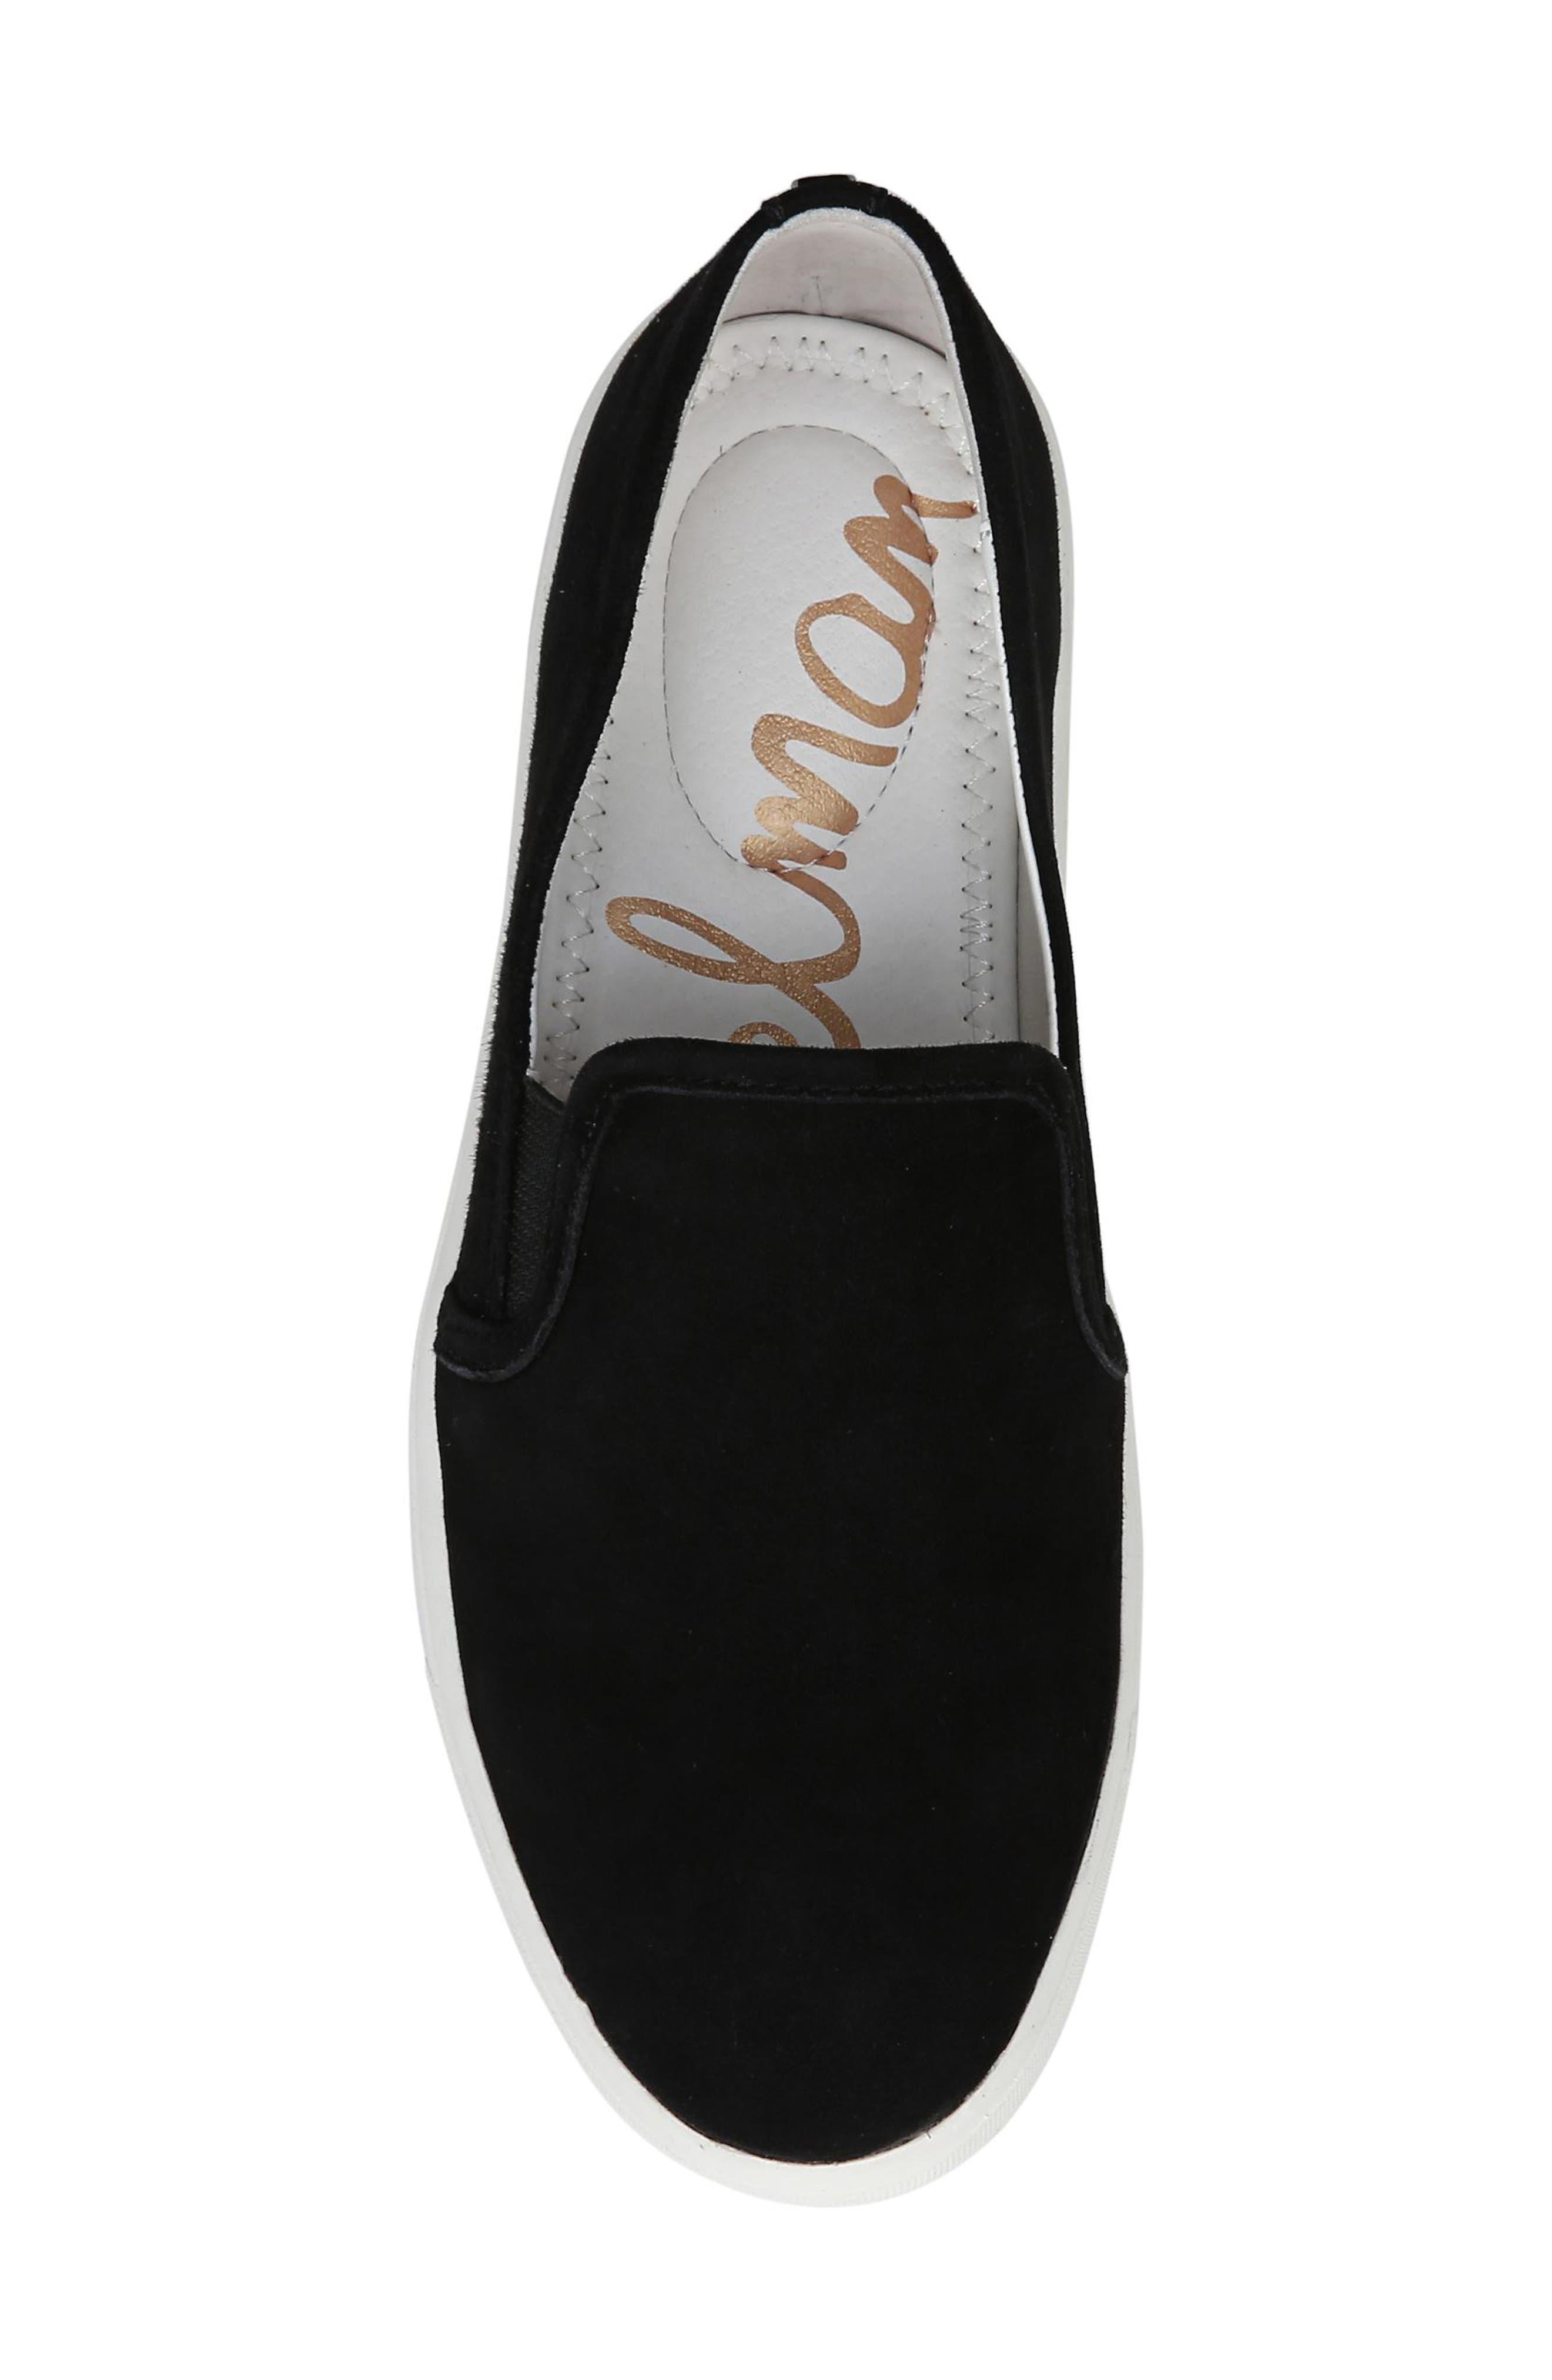 Elton Slip-On Sneaker,                             Alternate thumbnail 5, color,                             BLACK SUEDE LEATHER